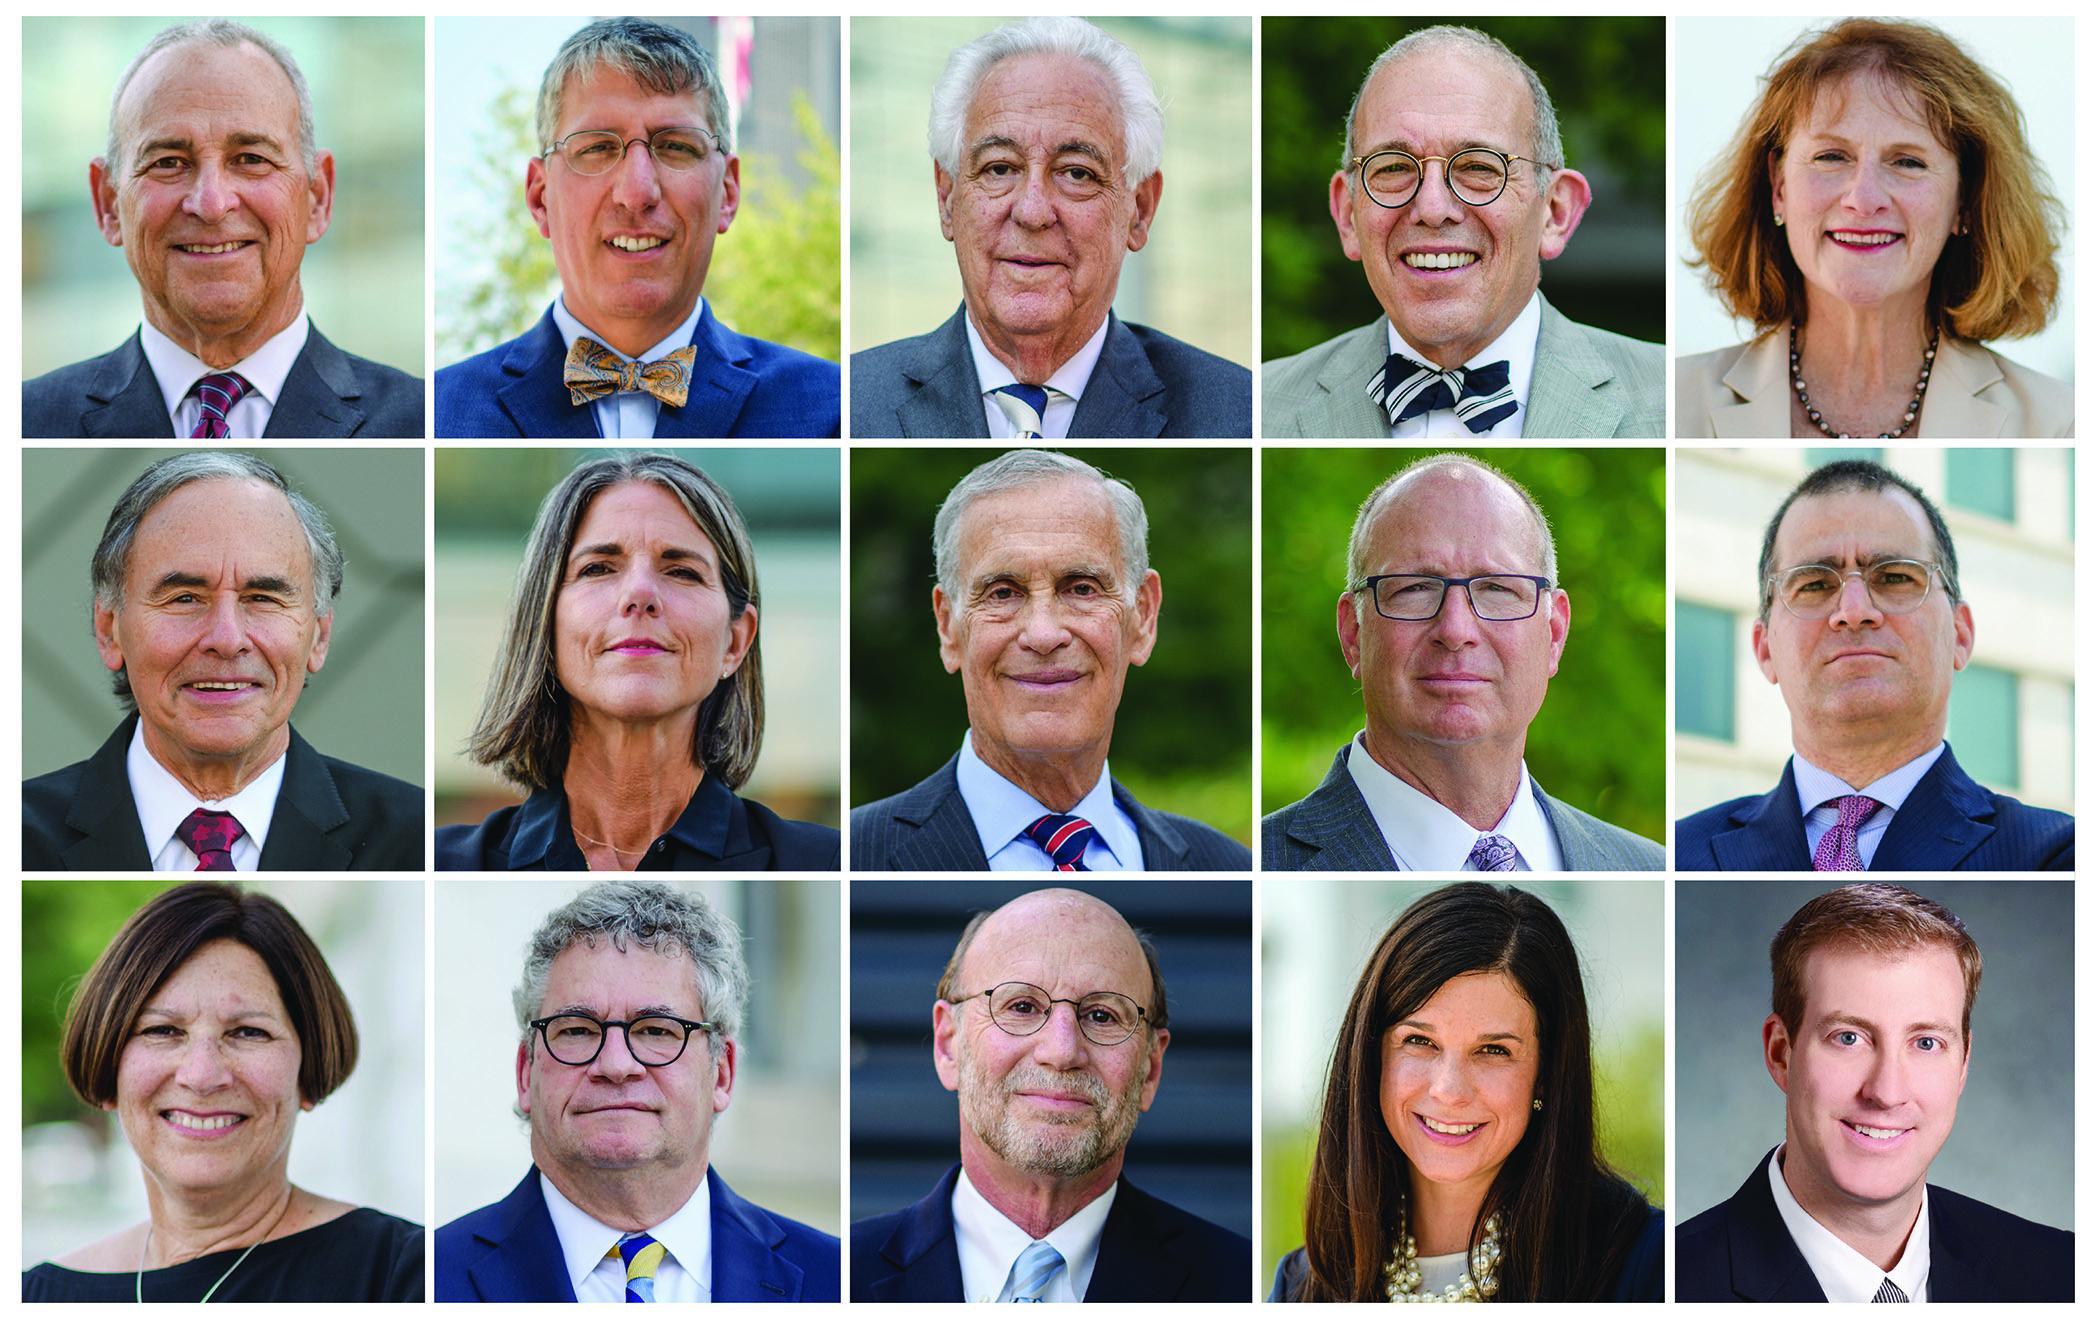 Maddin Hauser Michigan Super Lawyers 2020; image courtesy Maddin Hauser.